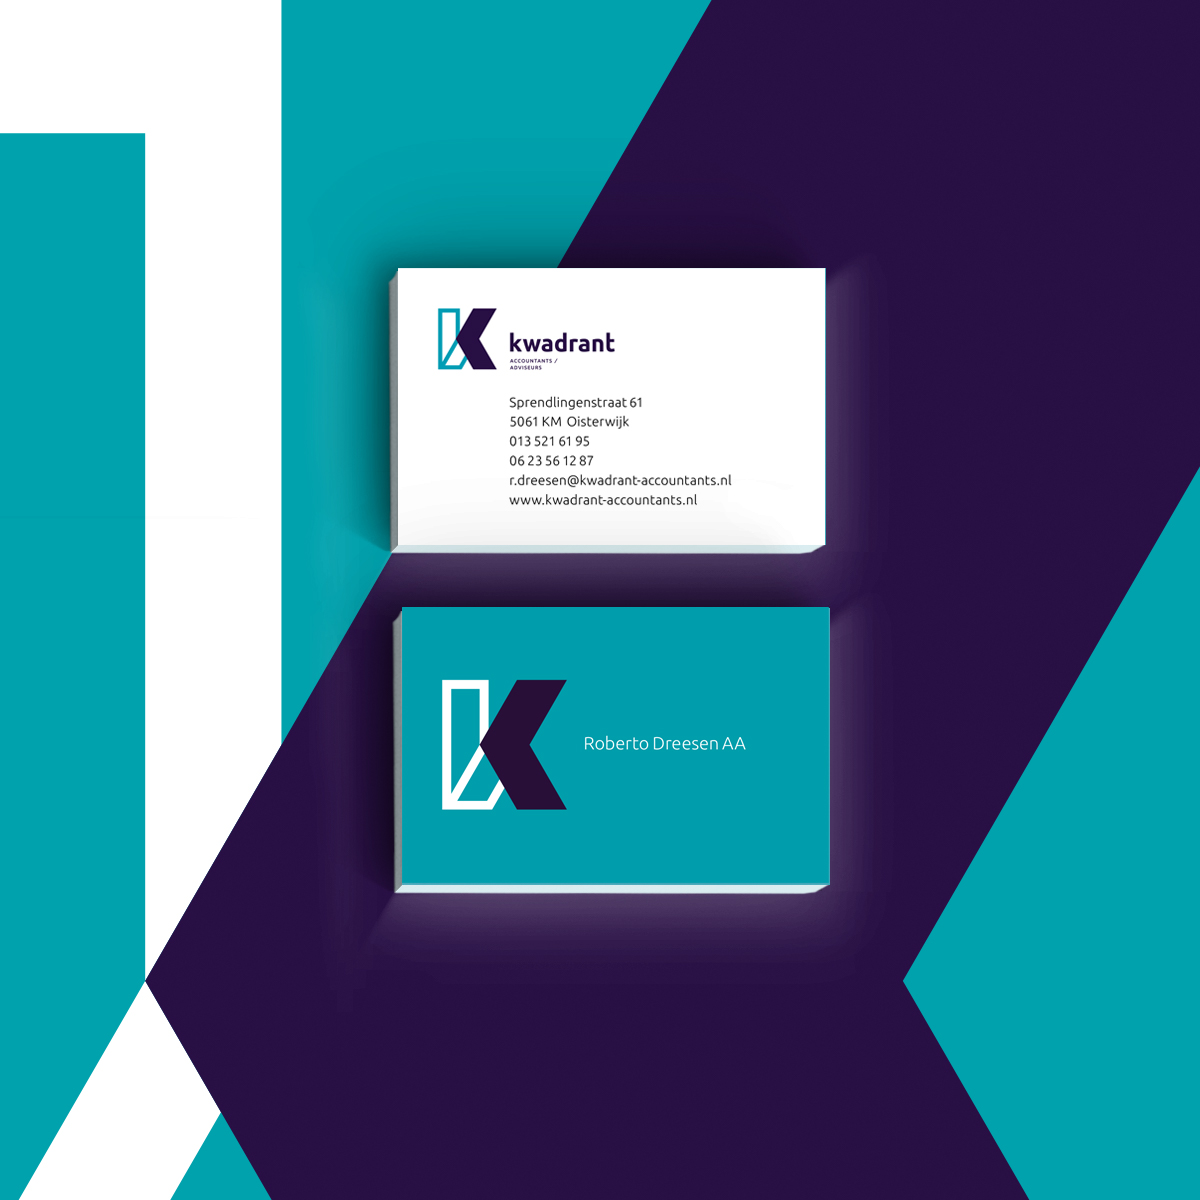 Kwadrant accountants / adviseurs